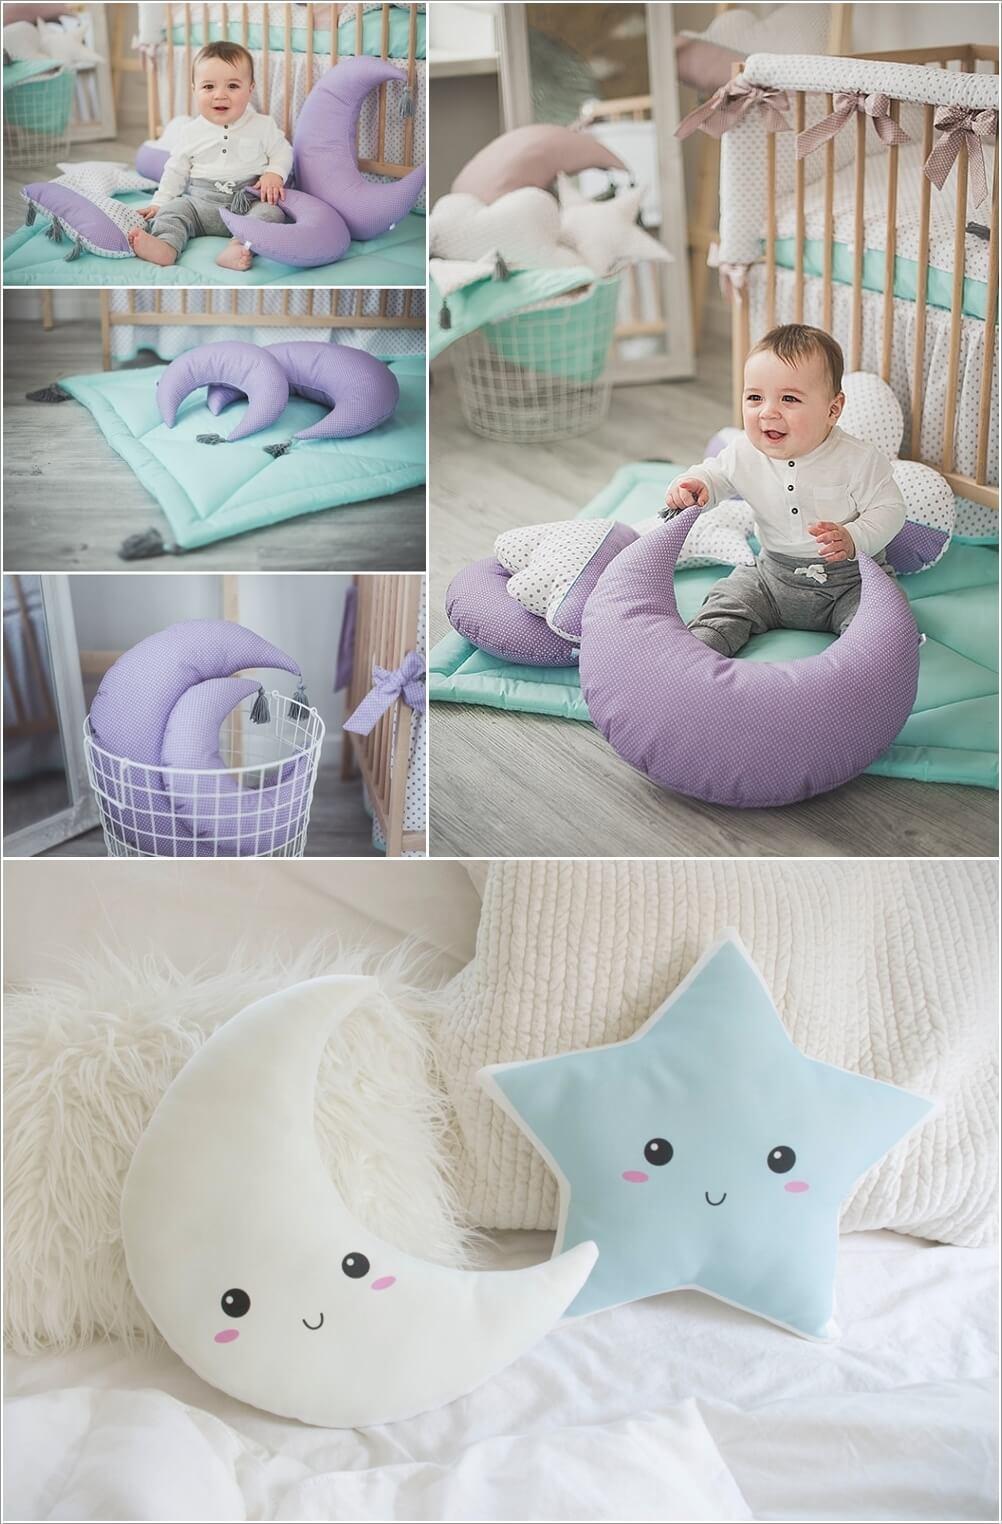 10 Super Cute Moon Inspired Nursery Decor Ideas 2